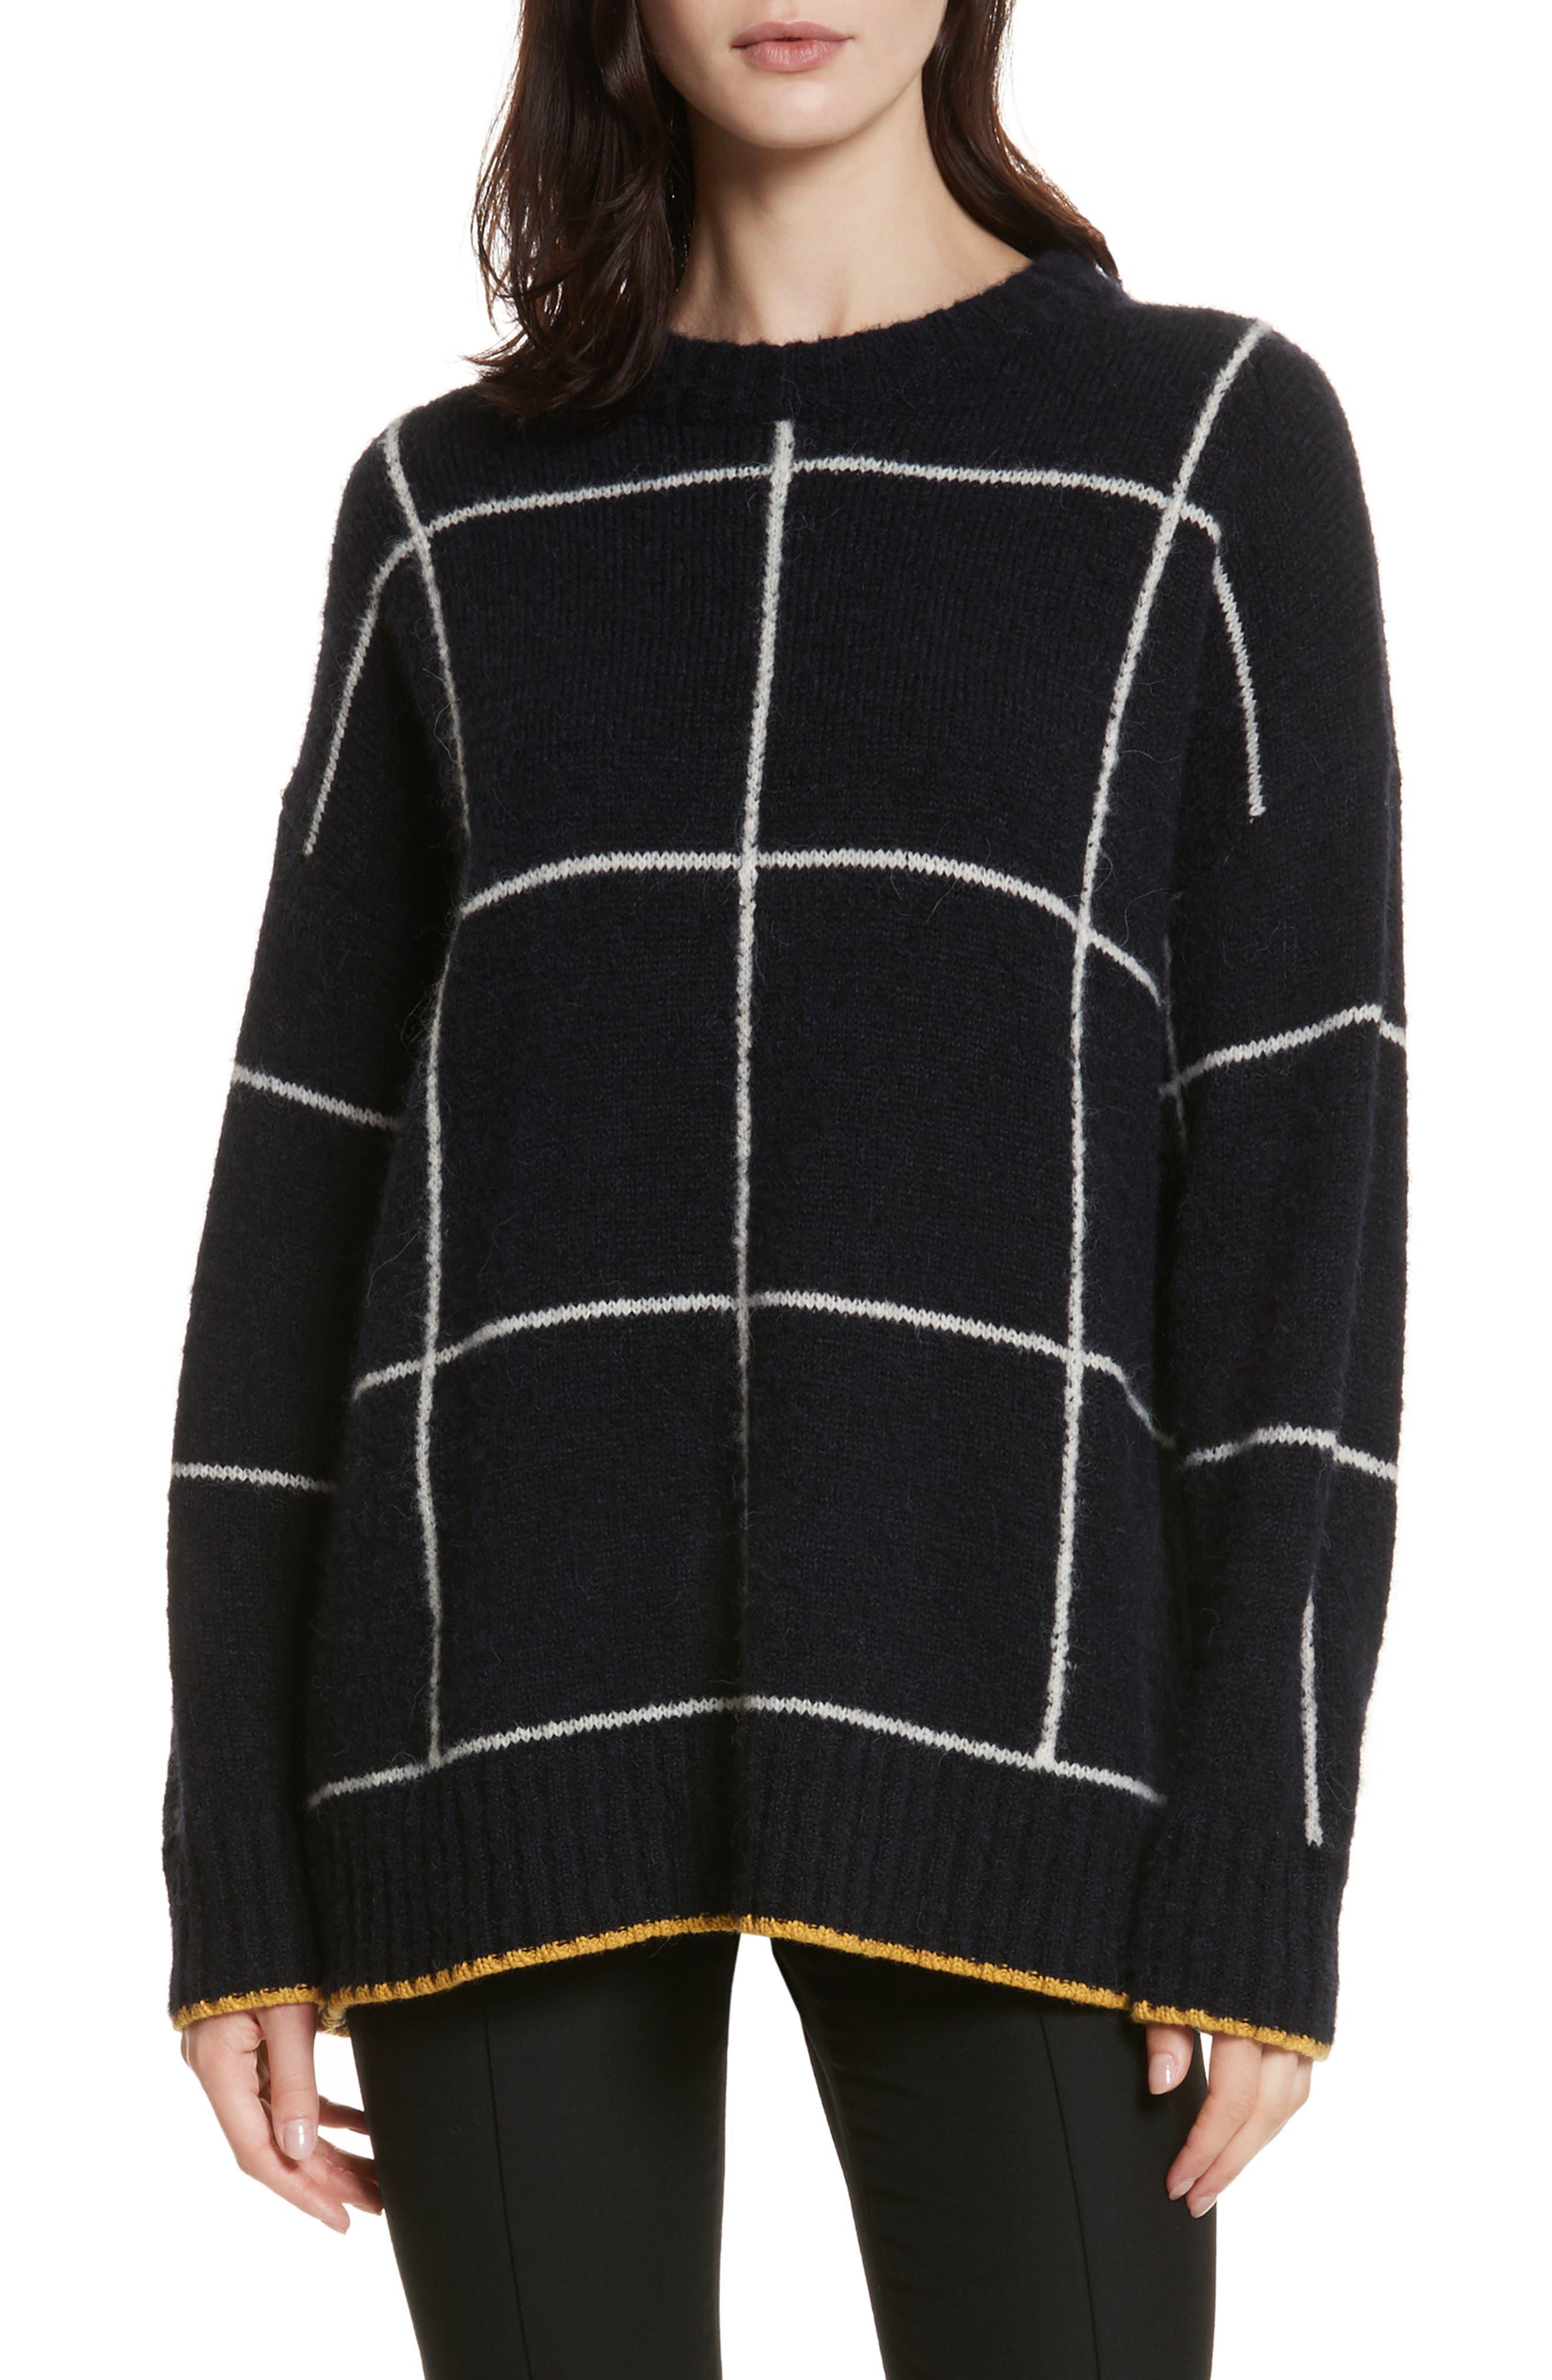 Main Image - Elizabeth and James Fionn Windowpane Oversized Sweater